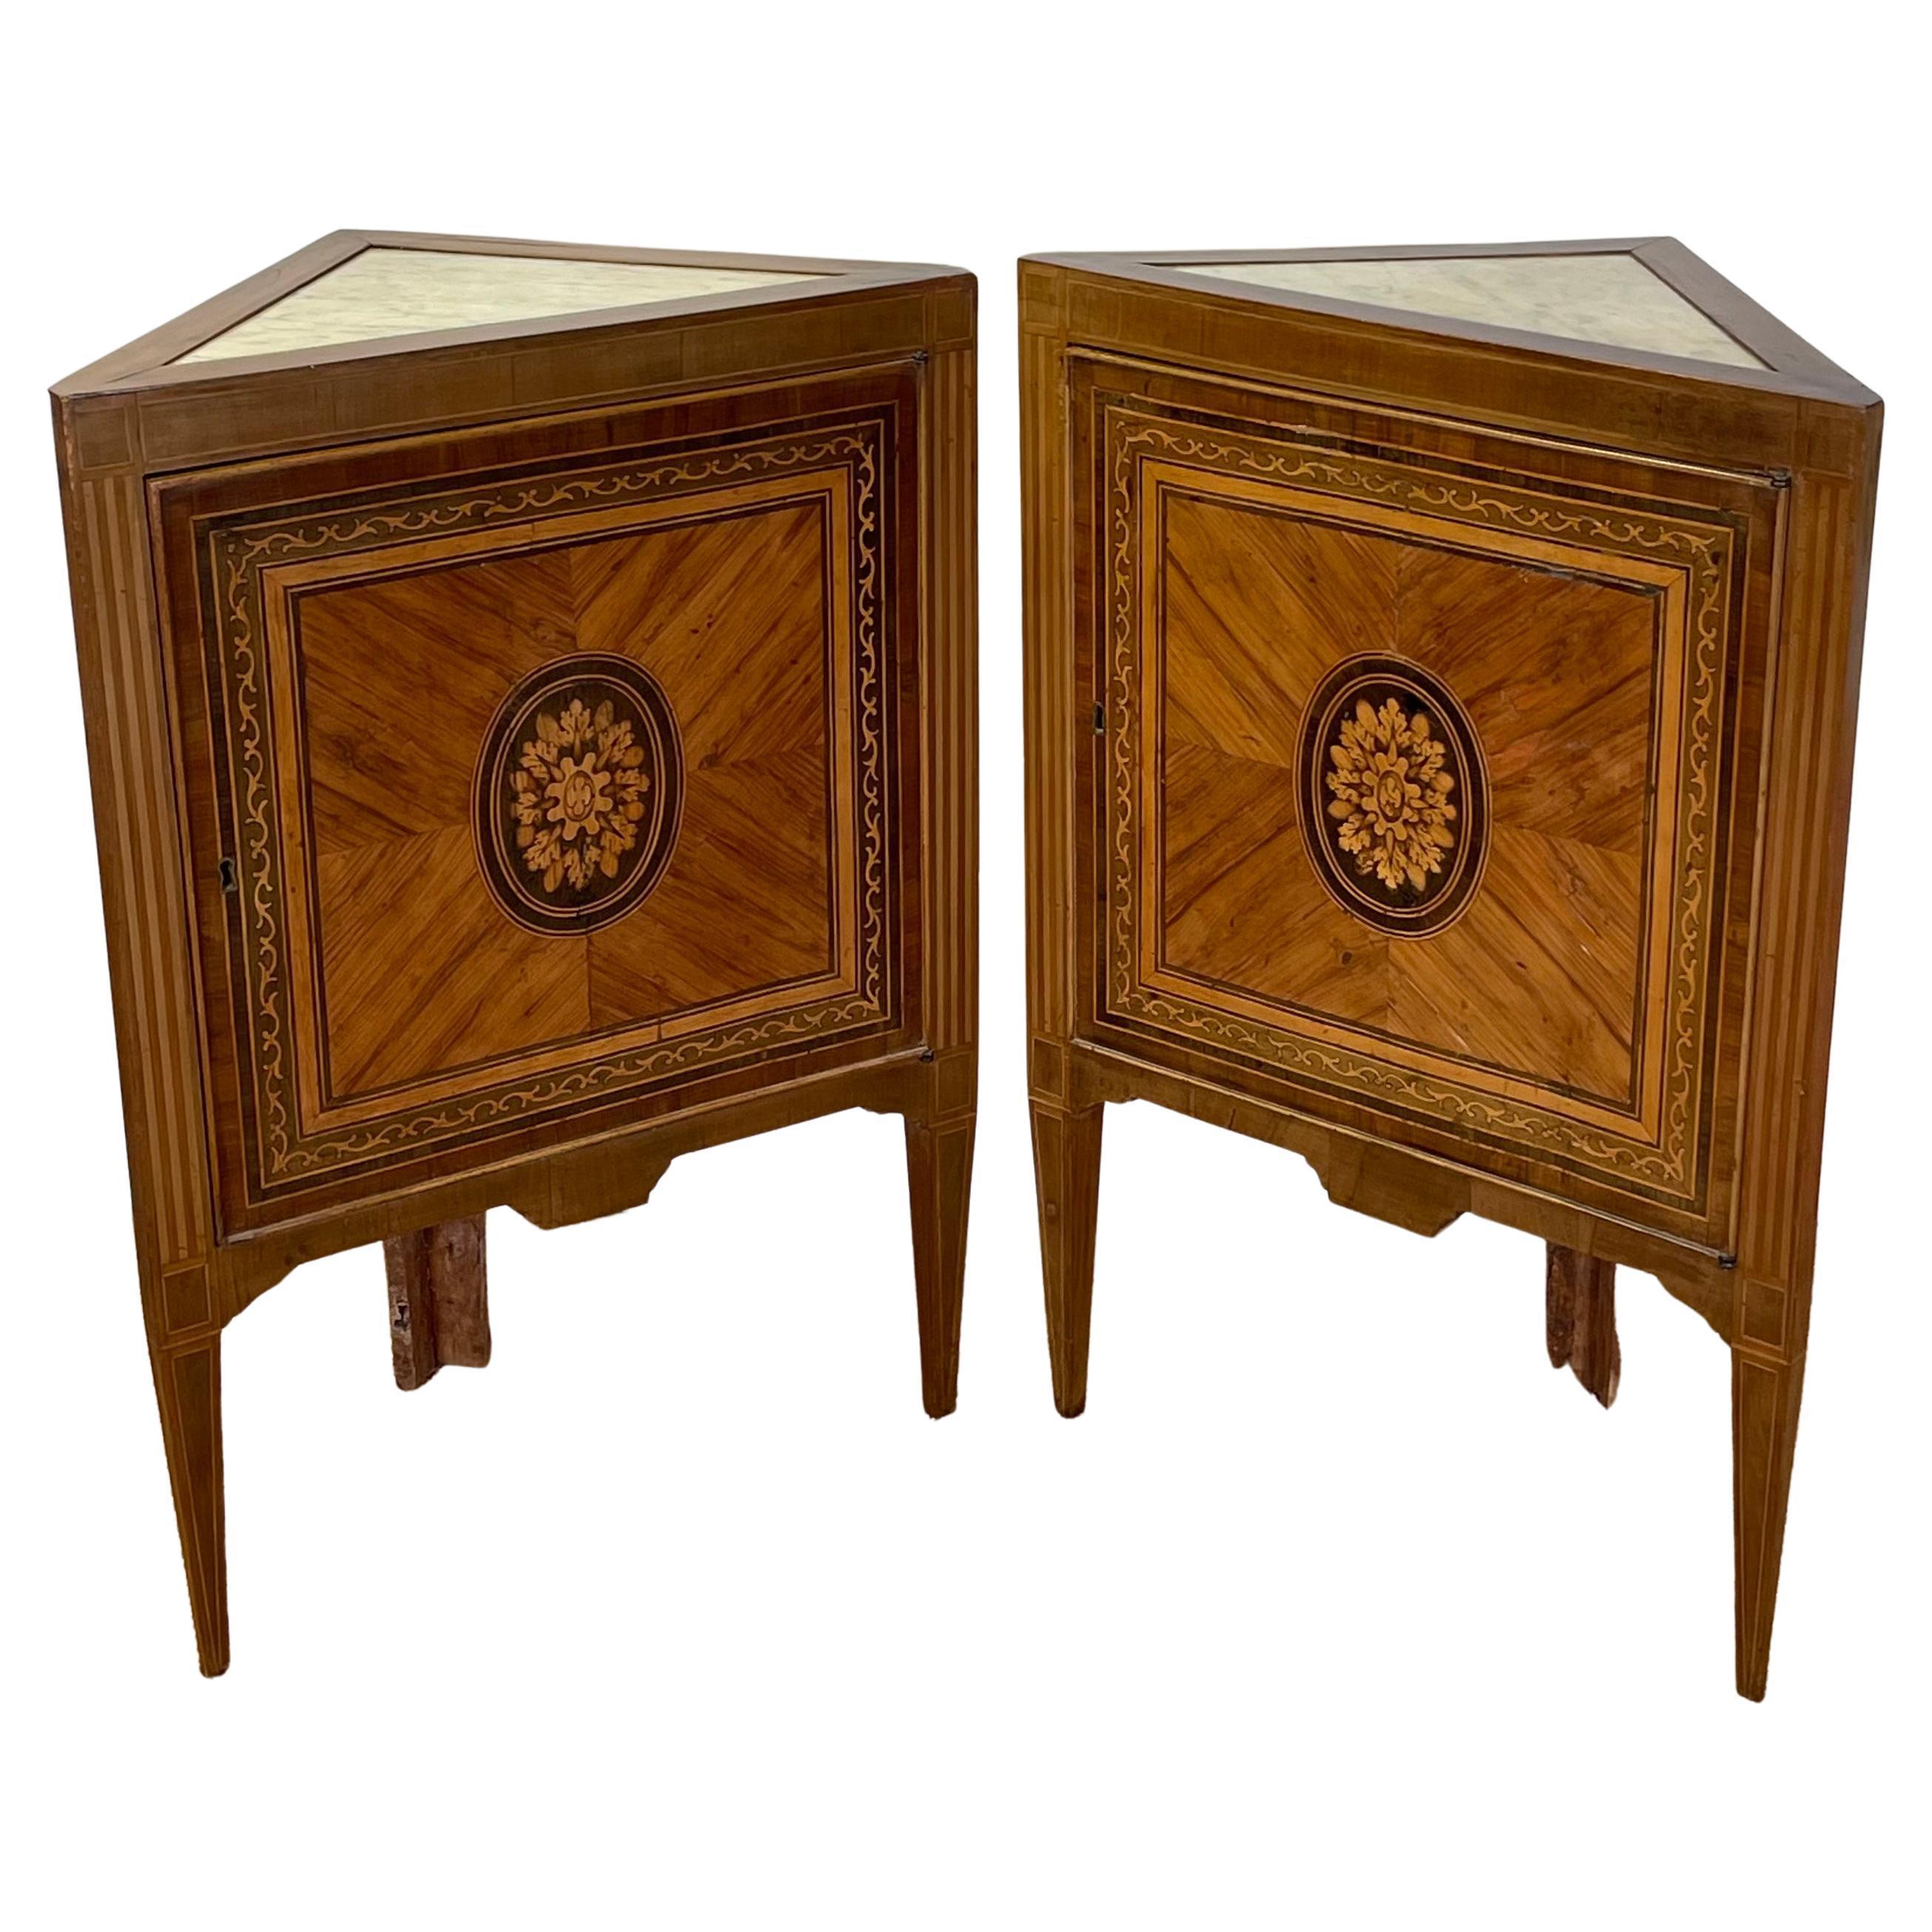 Pair of Italian Neoclassical Corner Cabinets